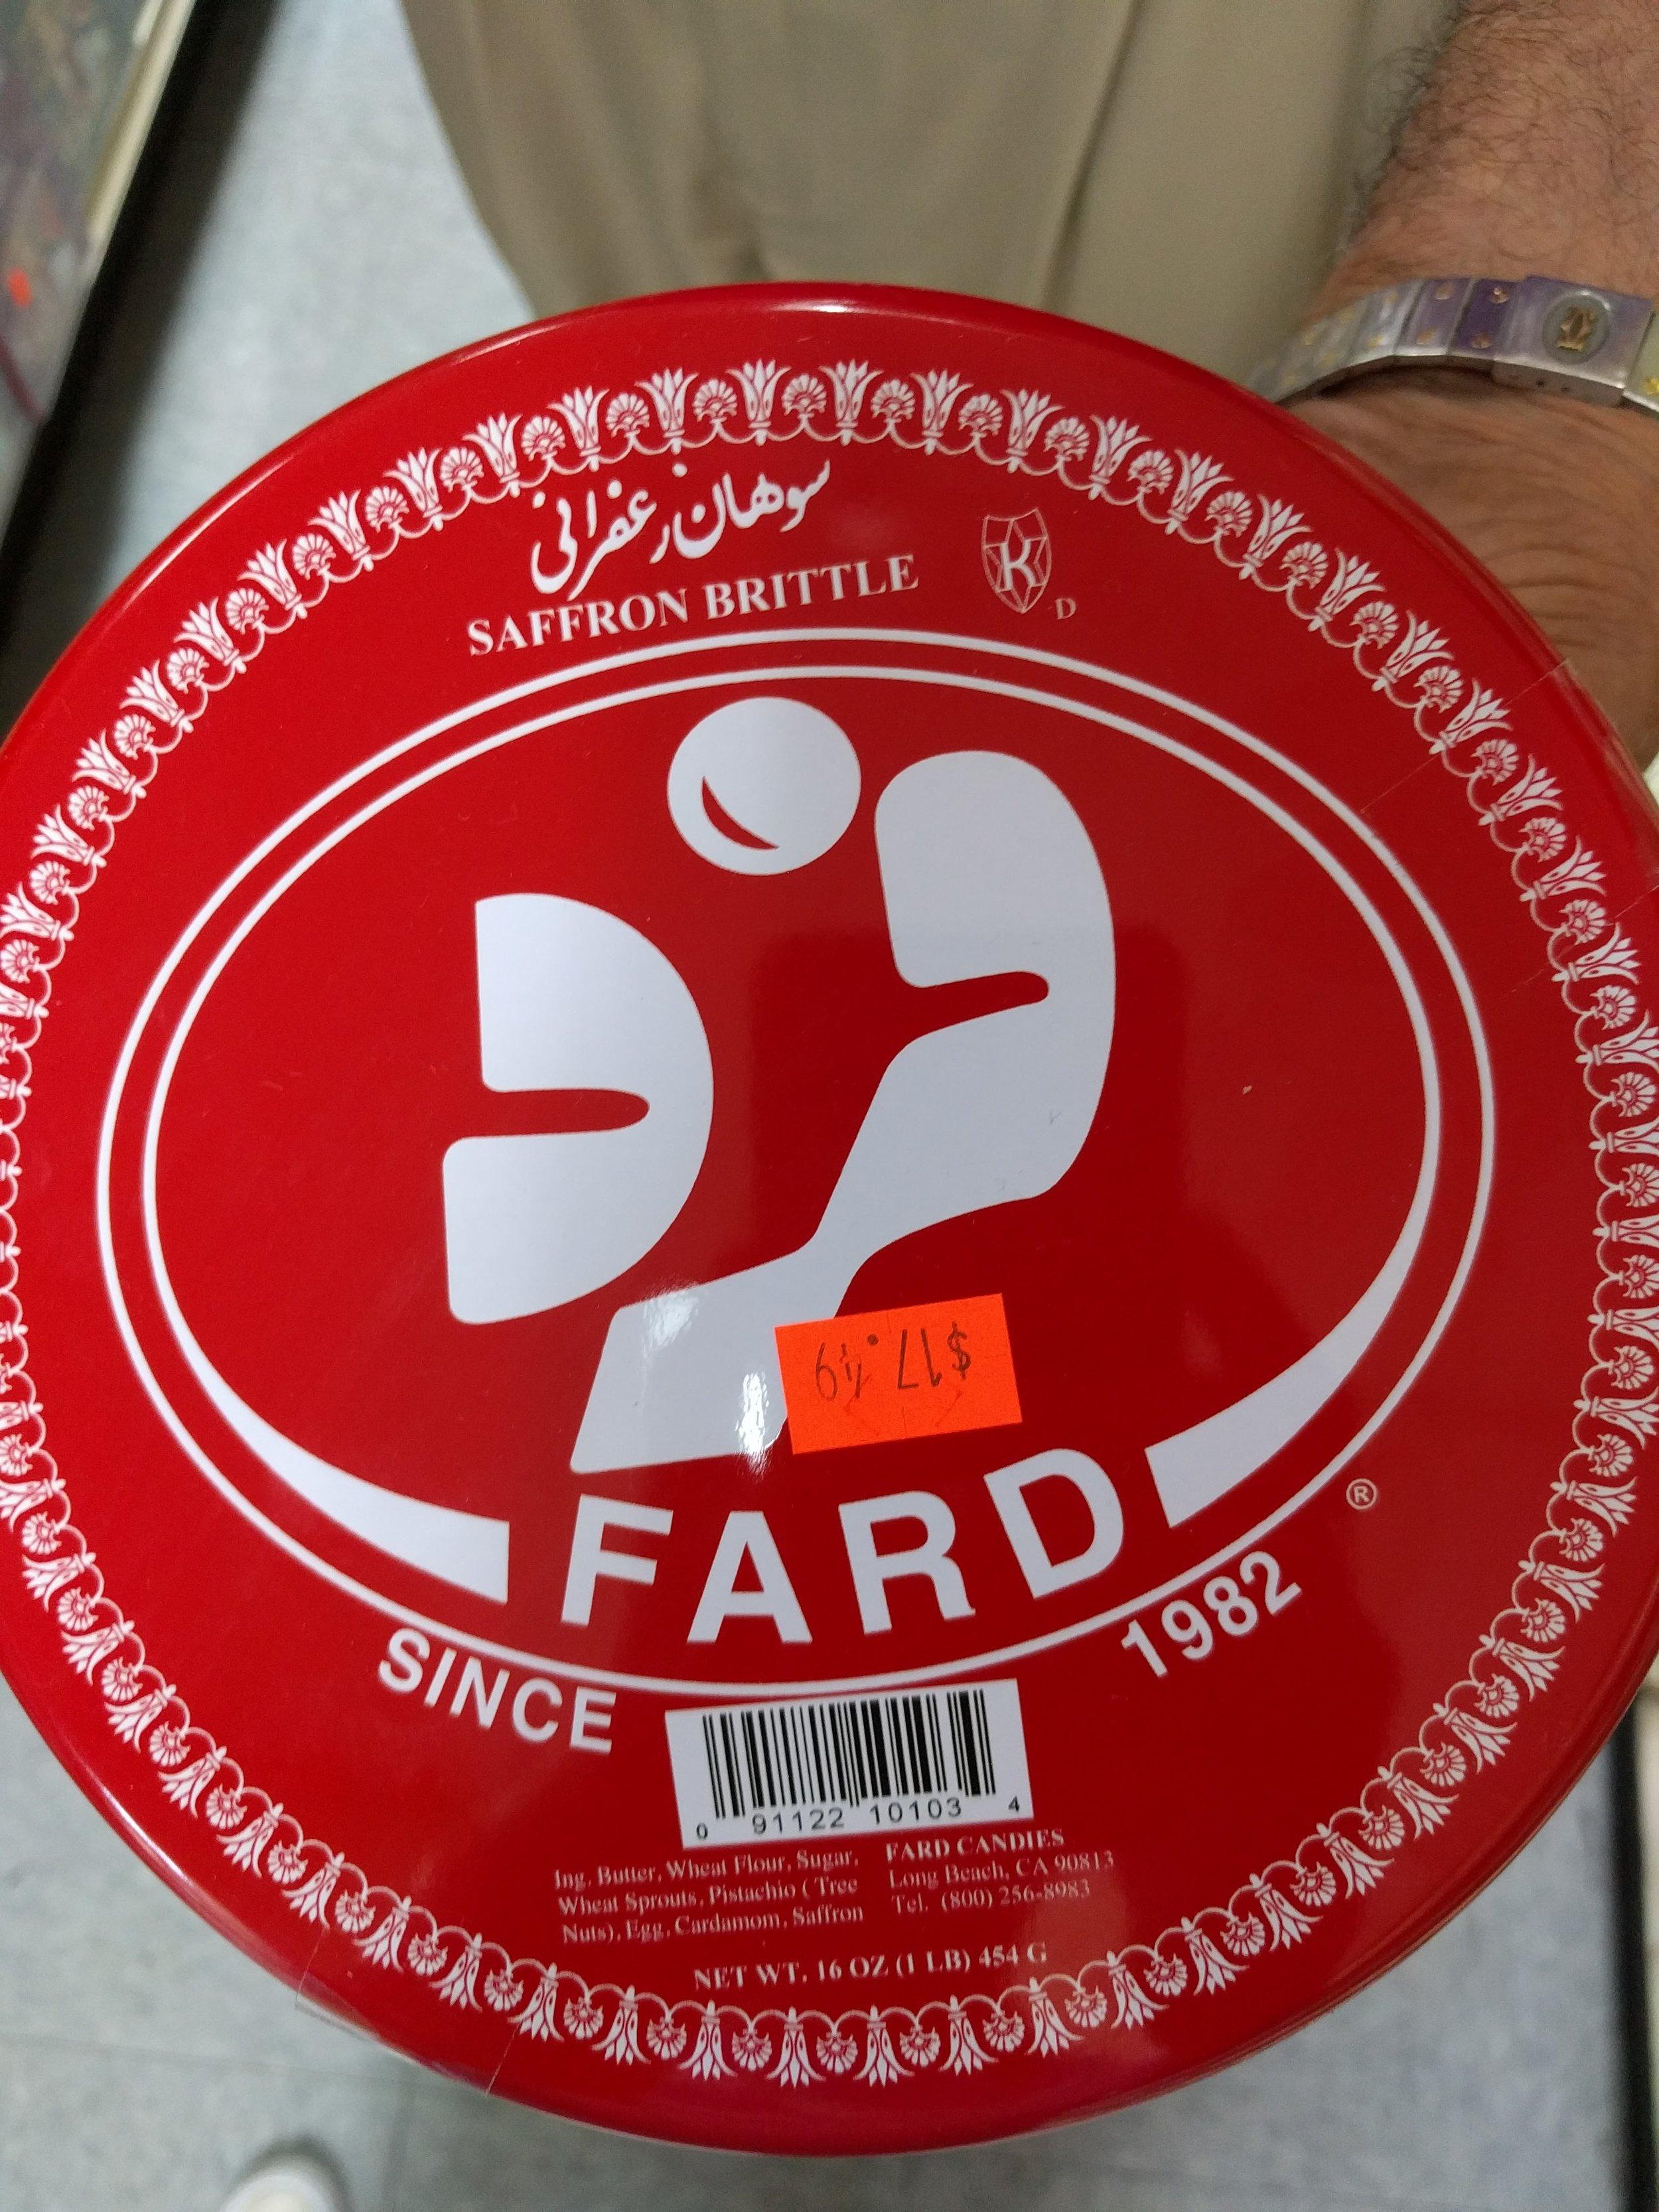 Saffron-brittle-Pak-Halal-International-Foods-12259-W-87th-St-Pkwy-Lenexa-KS-66215.jpg